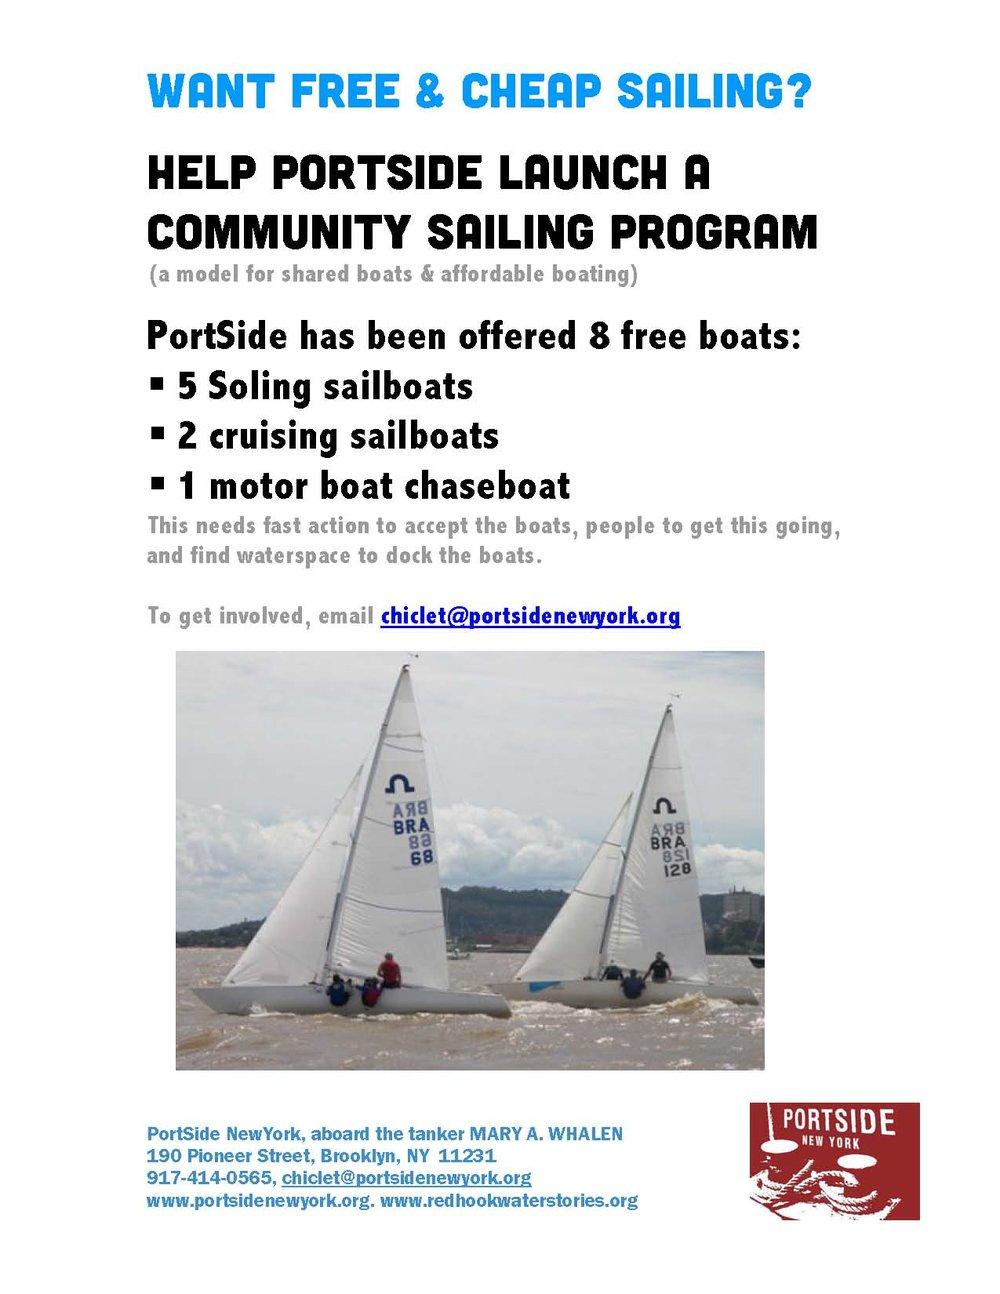 2018 PortSide NewYork Do you want Community Sailing.jpg